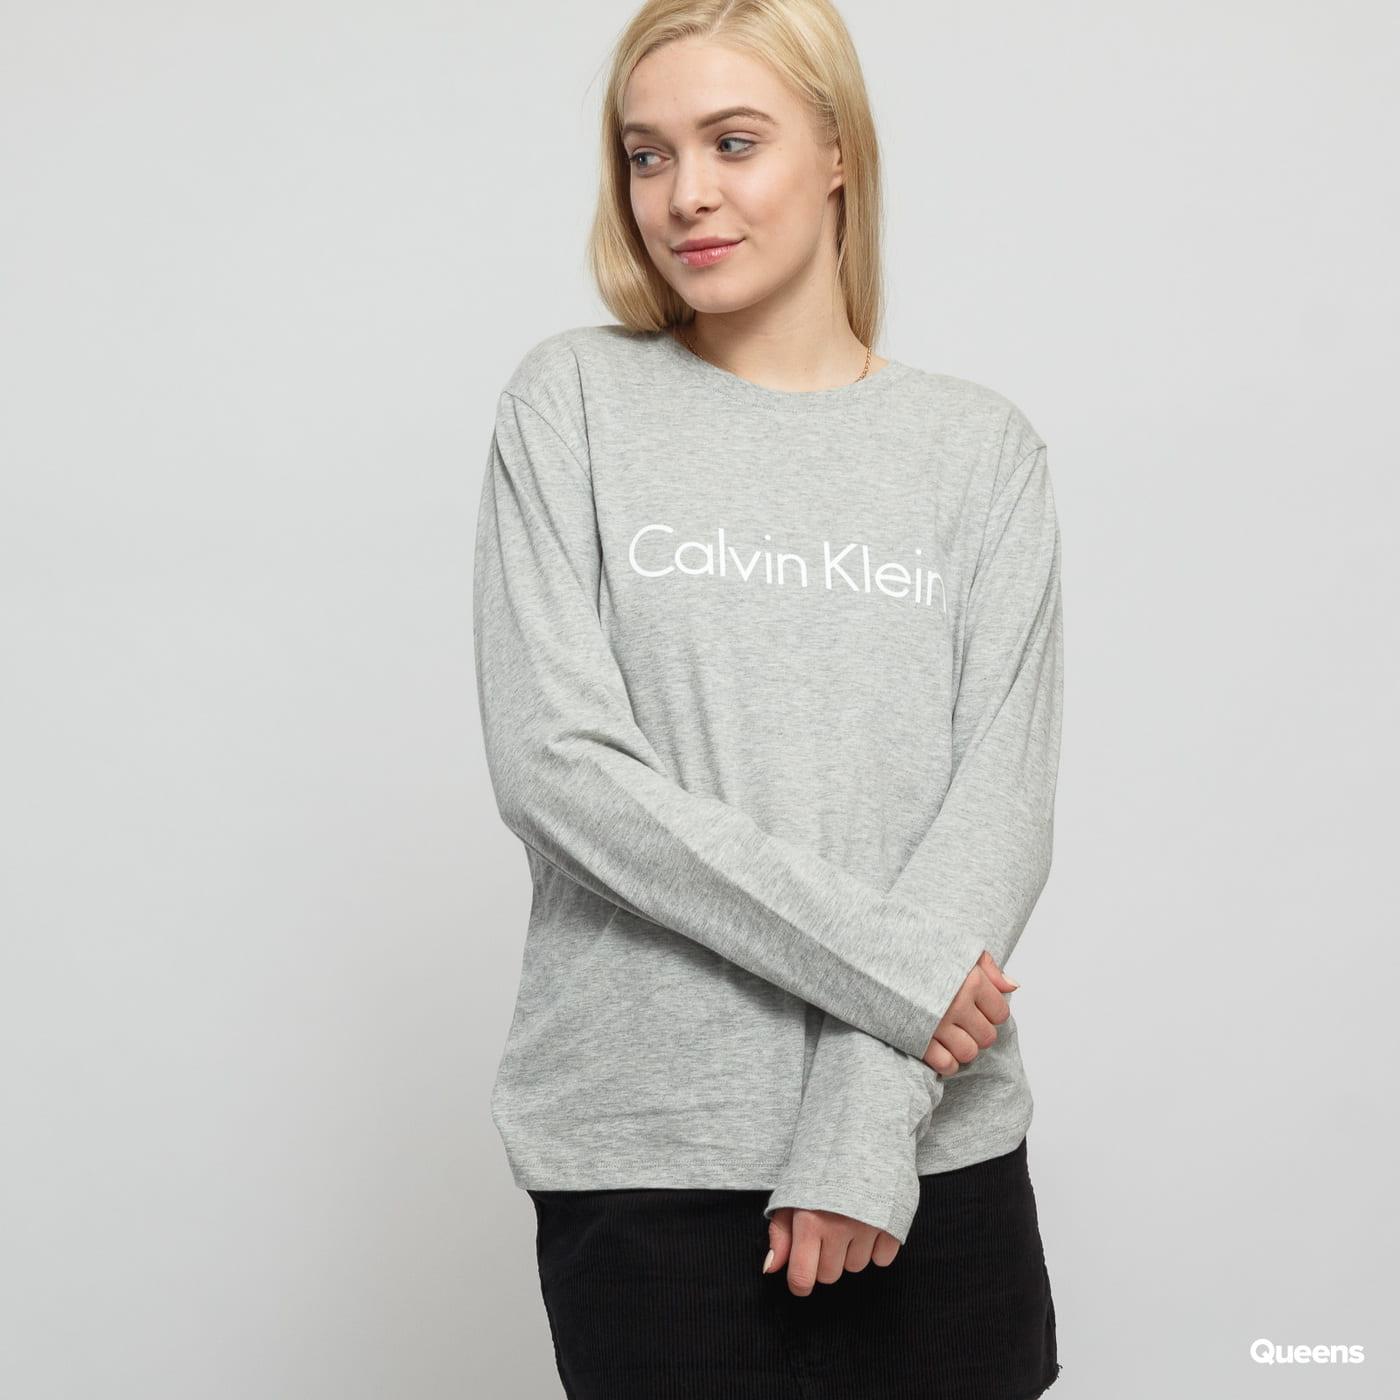 Calvin Klein LS Crew Neck C/O grau melange